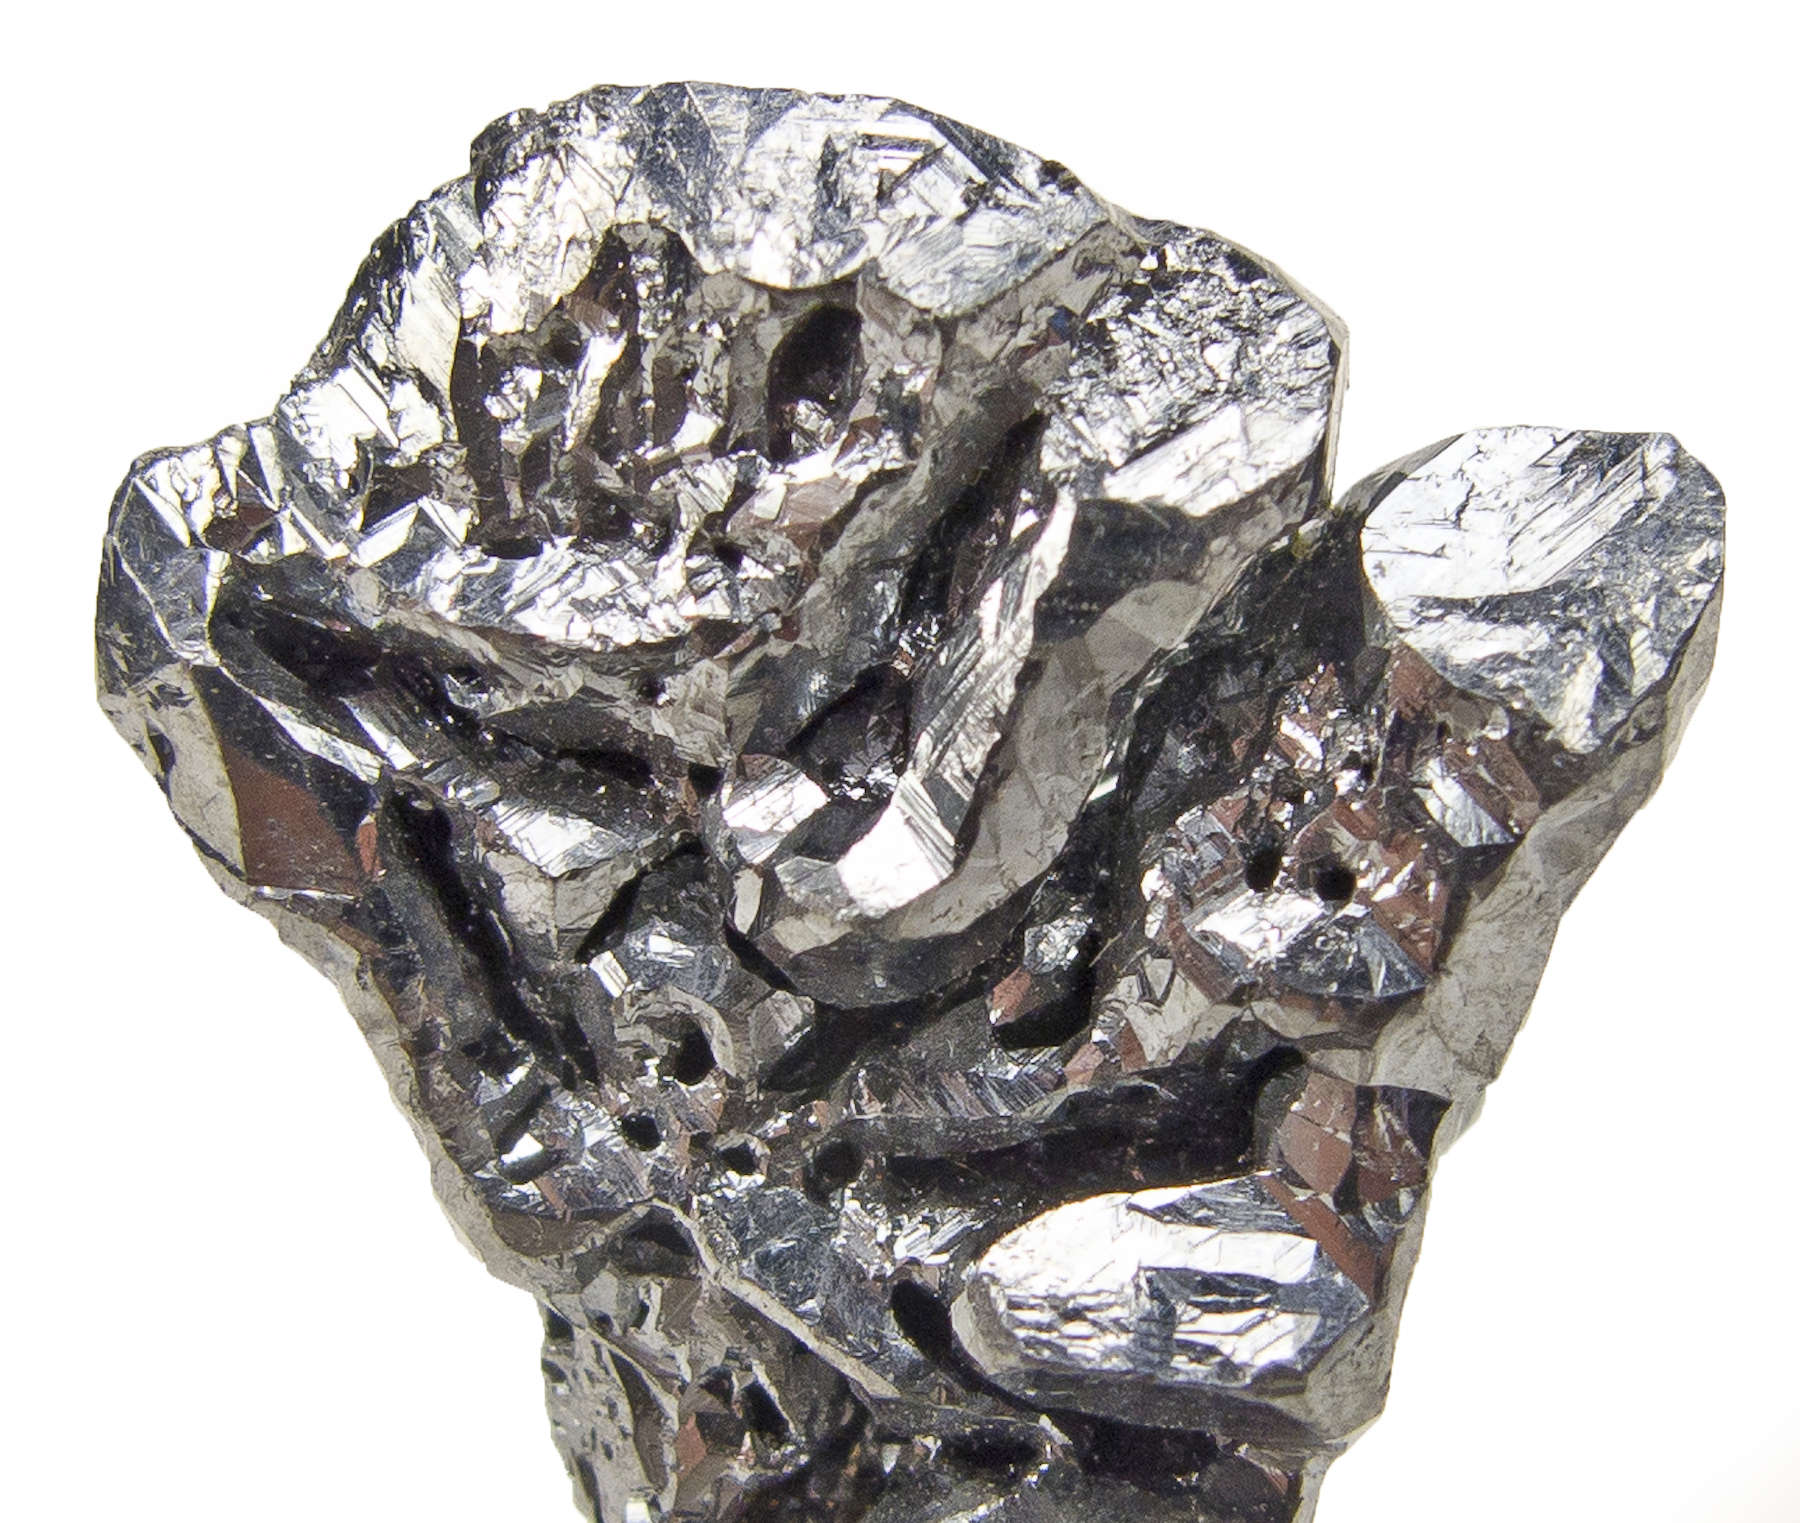 Stacked crystals 8 mm splendent dark gray acanthite aesthetically